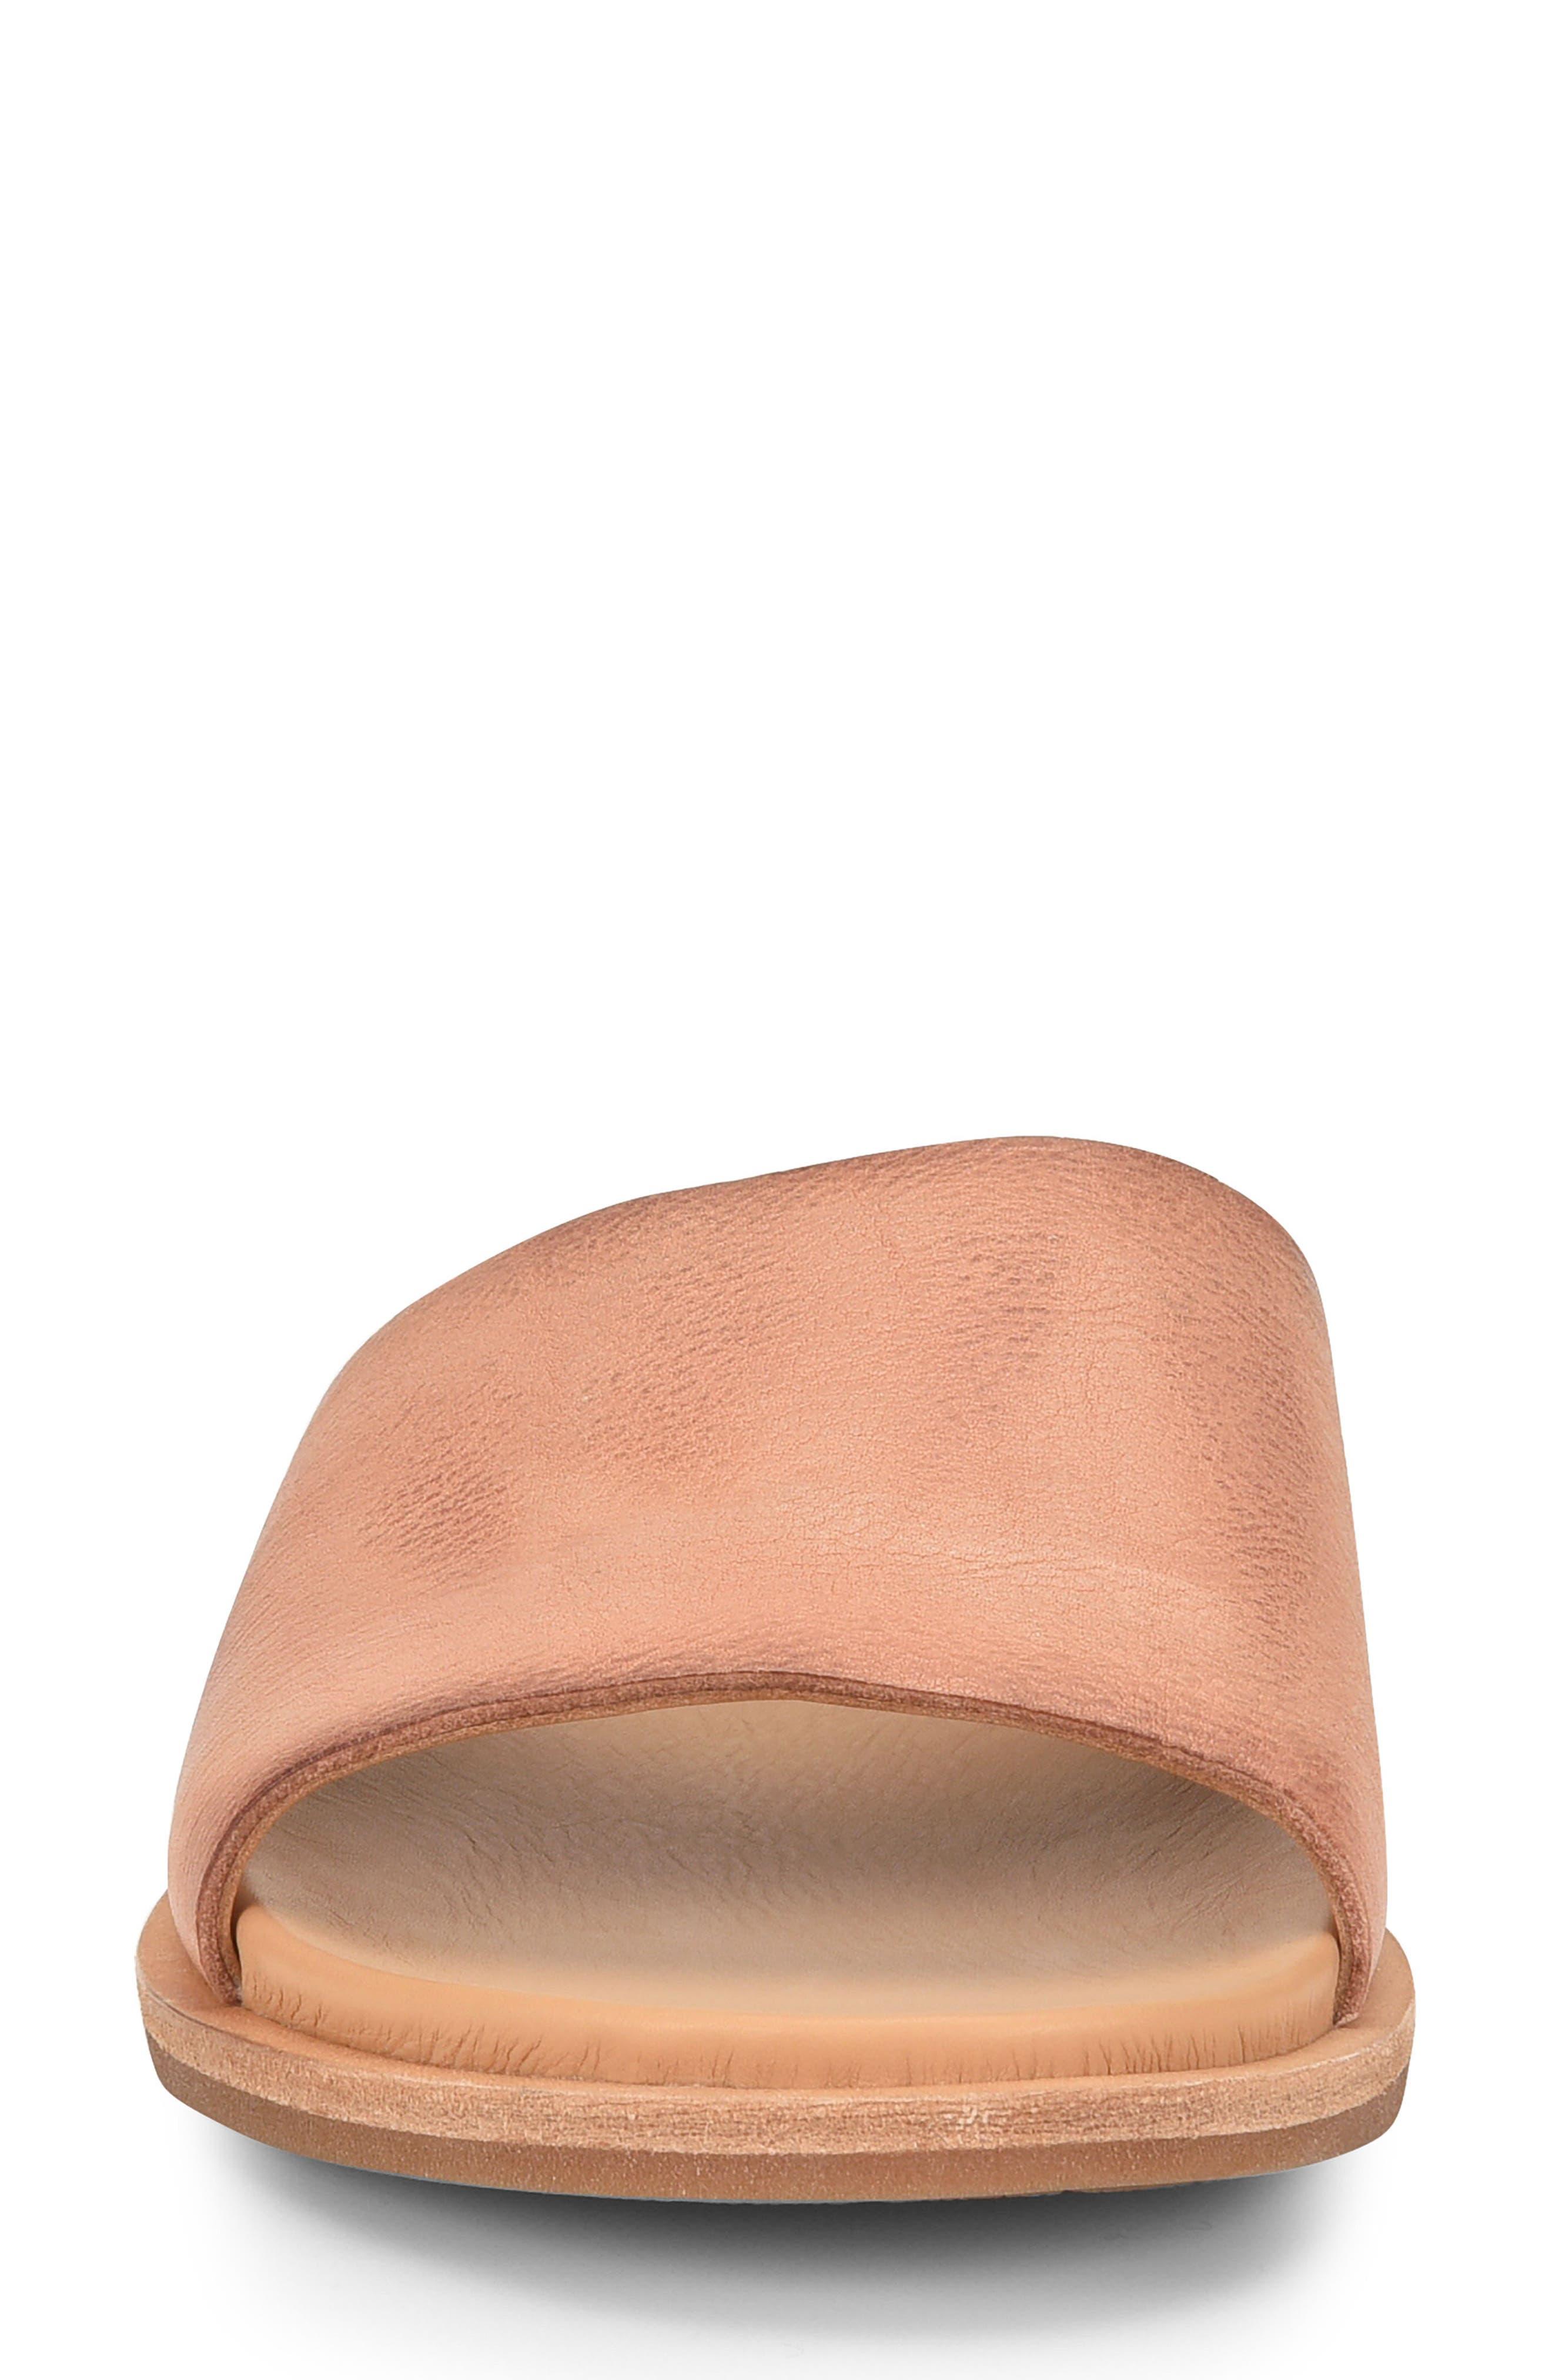 Gila Slide Sandal,                             Alternate thumbnail 4, color,                             Blush Leather